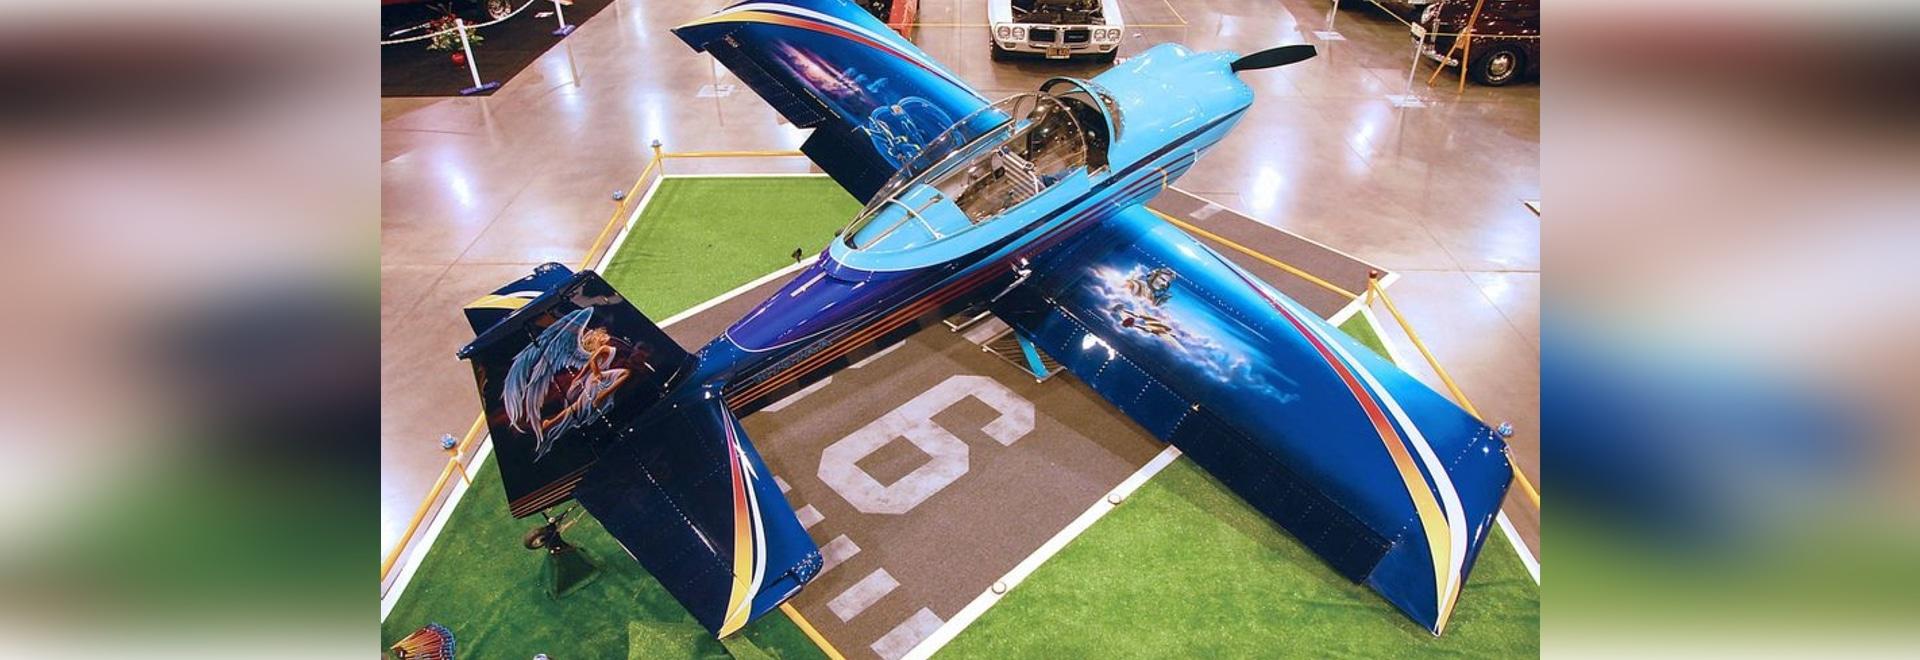 "John Stahr's RV-8 ""American Angel"" on display at the Portland, Oregon Hot Rod Show."